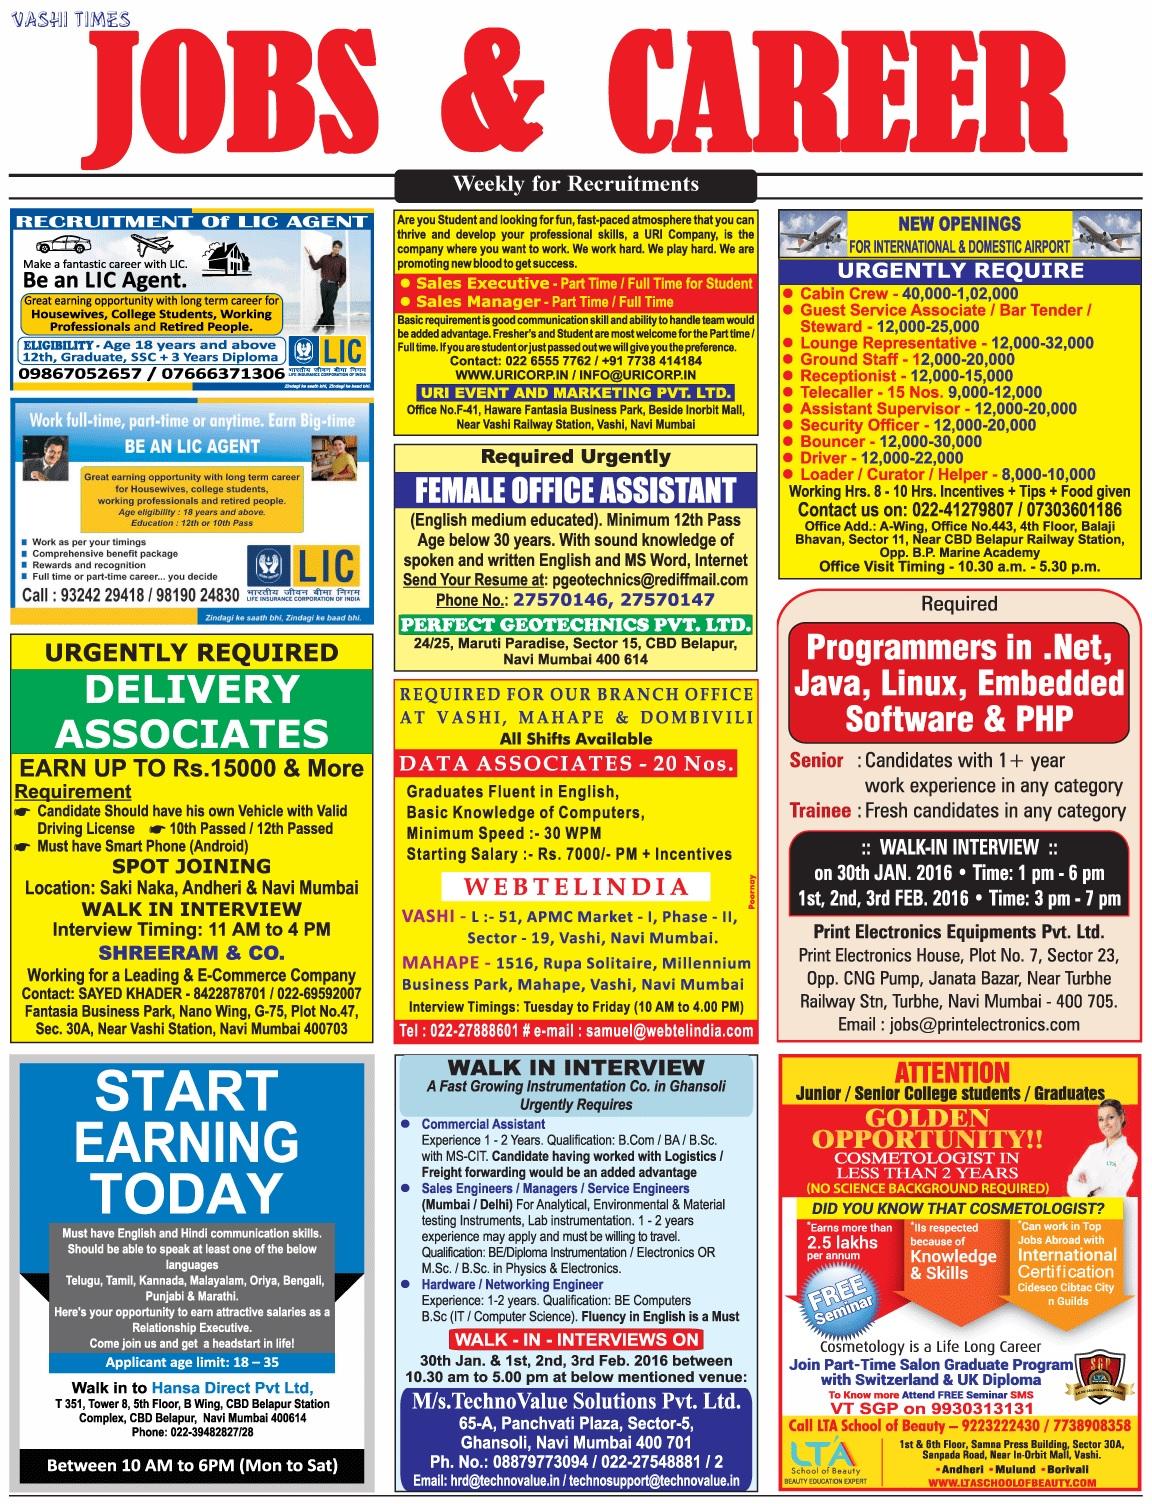 Employment nri times epaper page 4